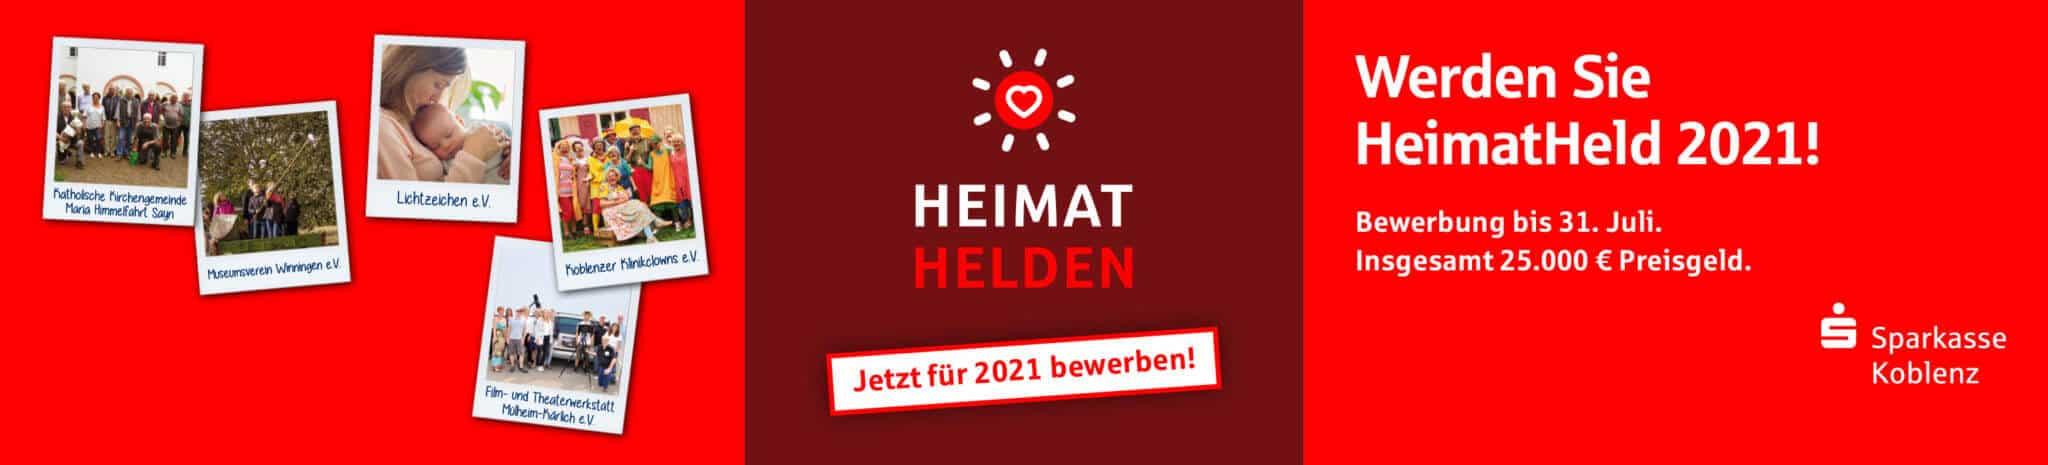 HeimatHelden Banner Bewerbung 2021